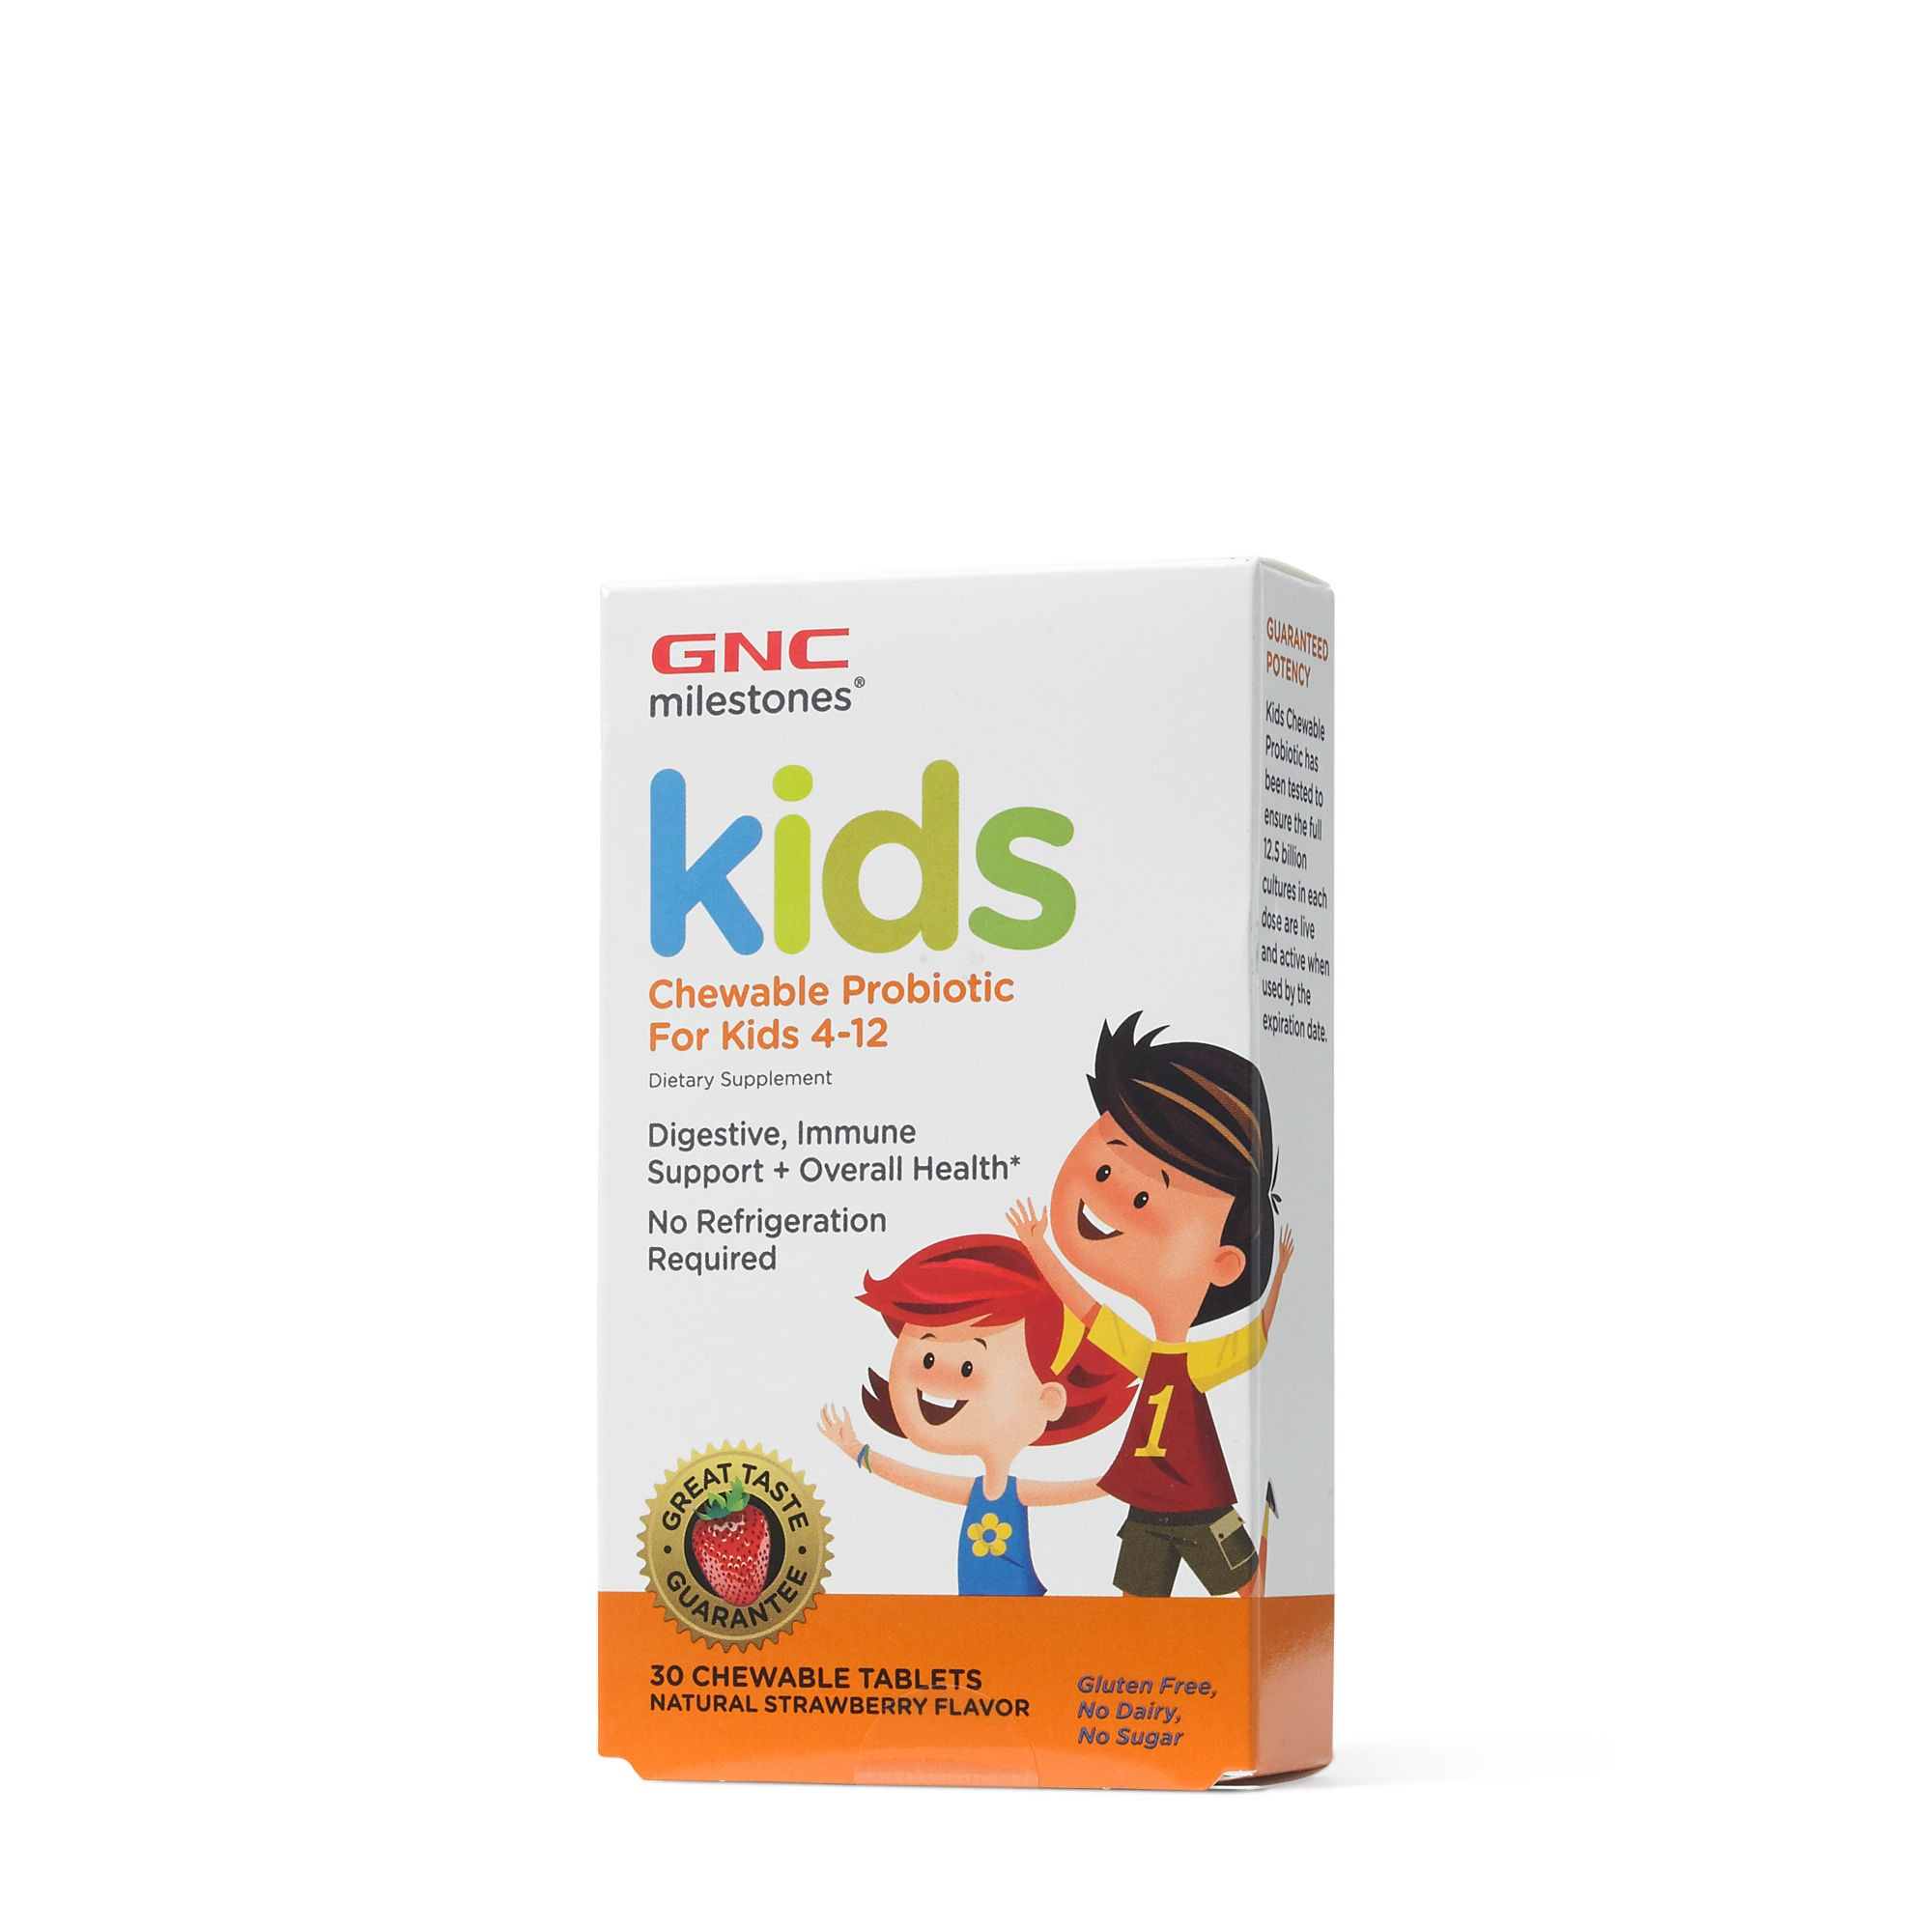 Detox pentru copii. Da sau nu?